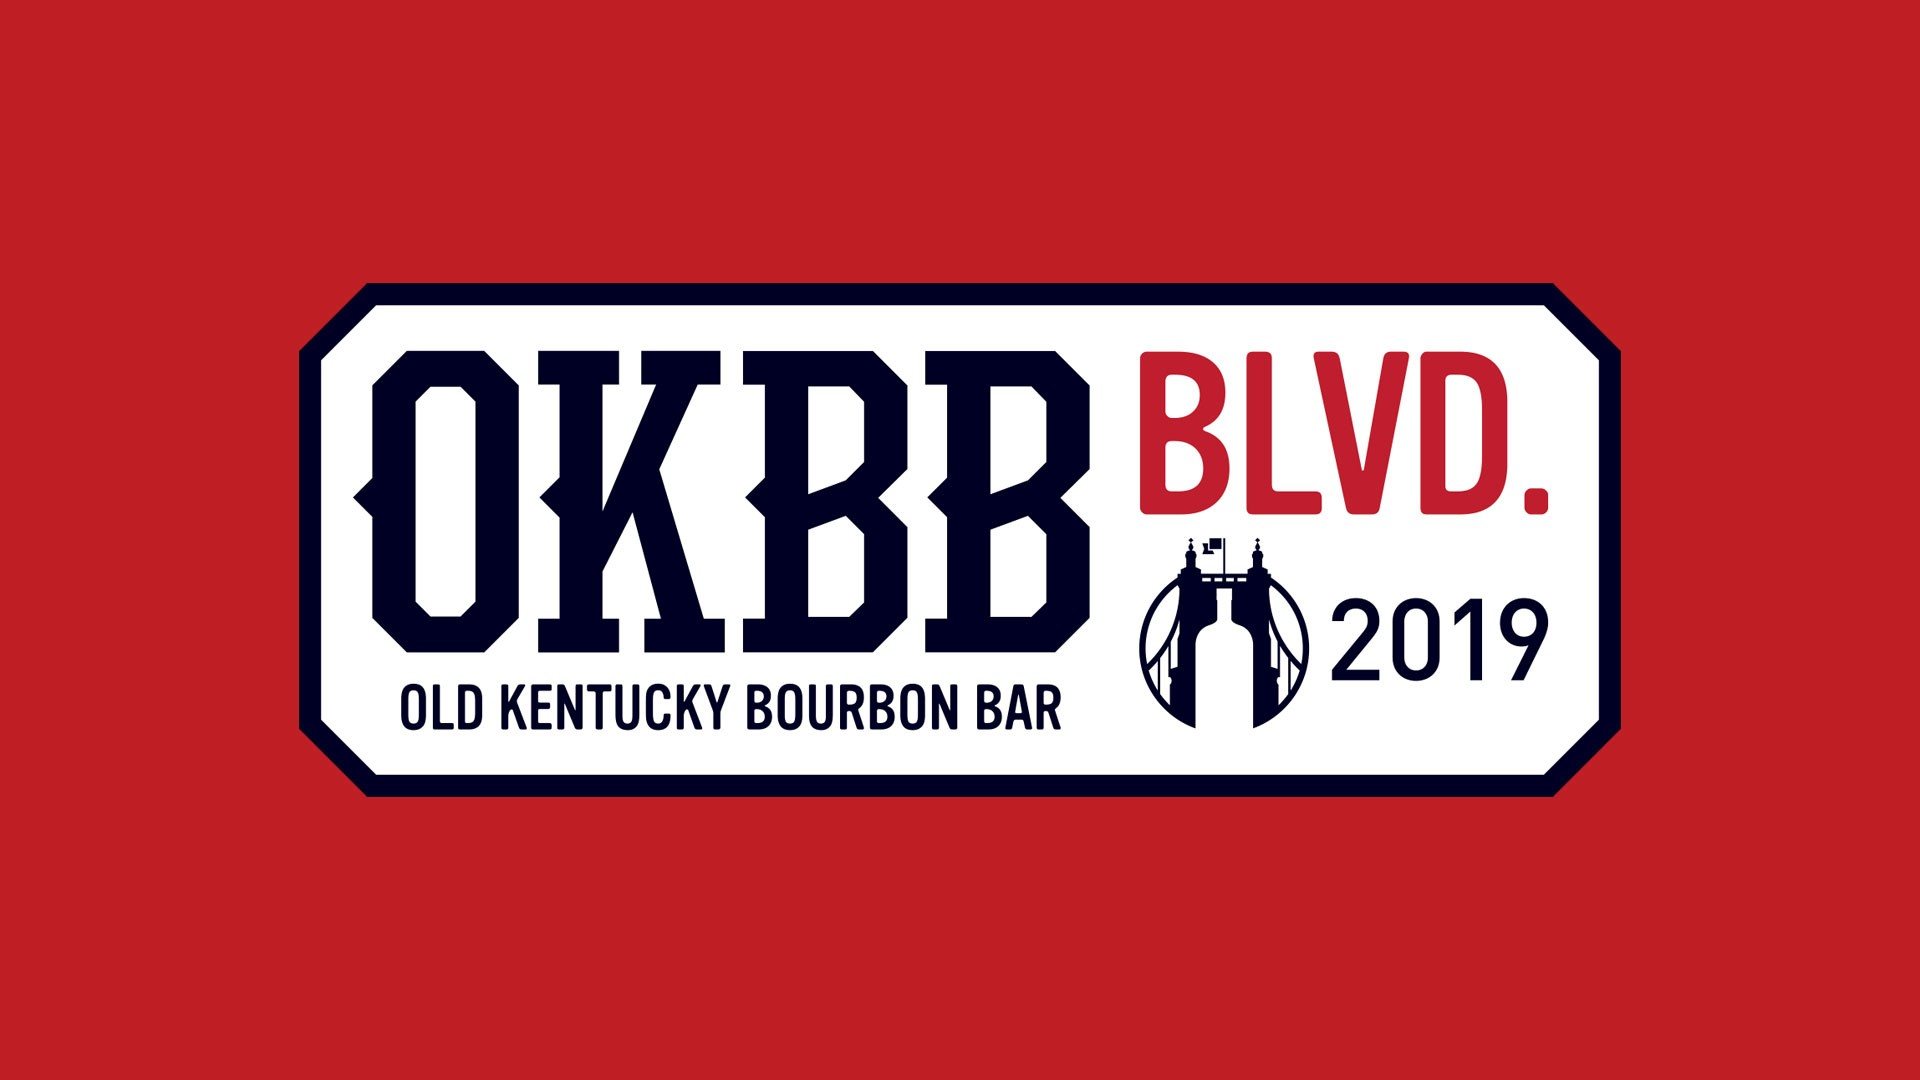 OKBB-BLVD-graphic